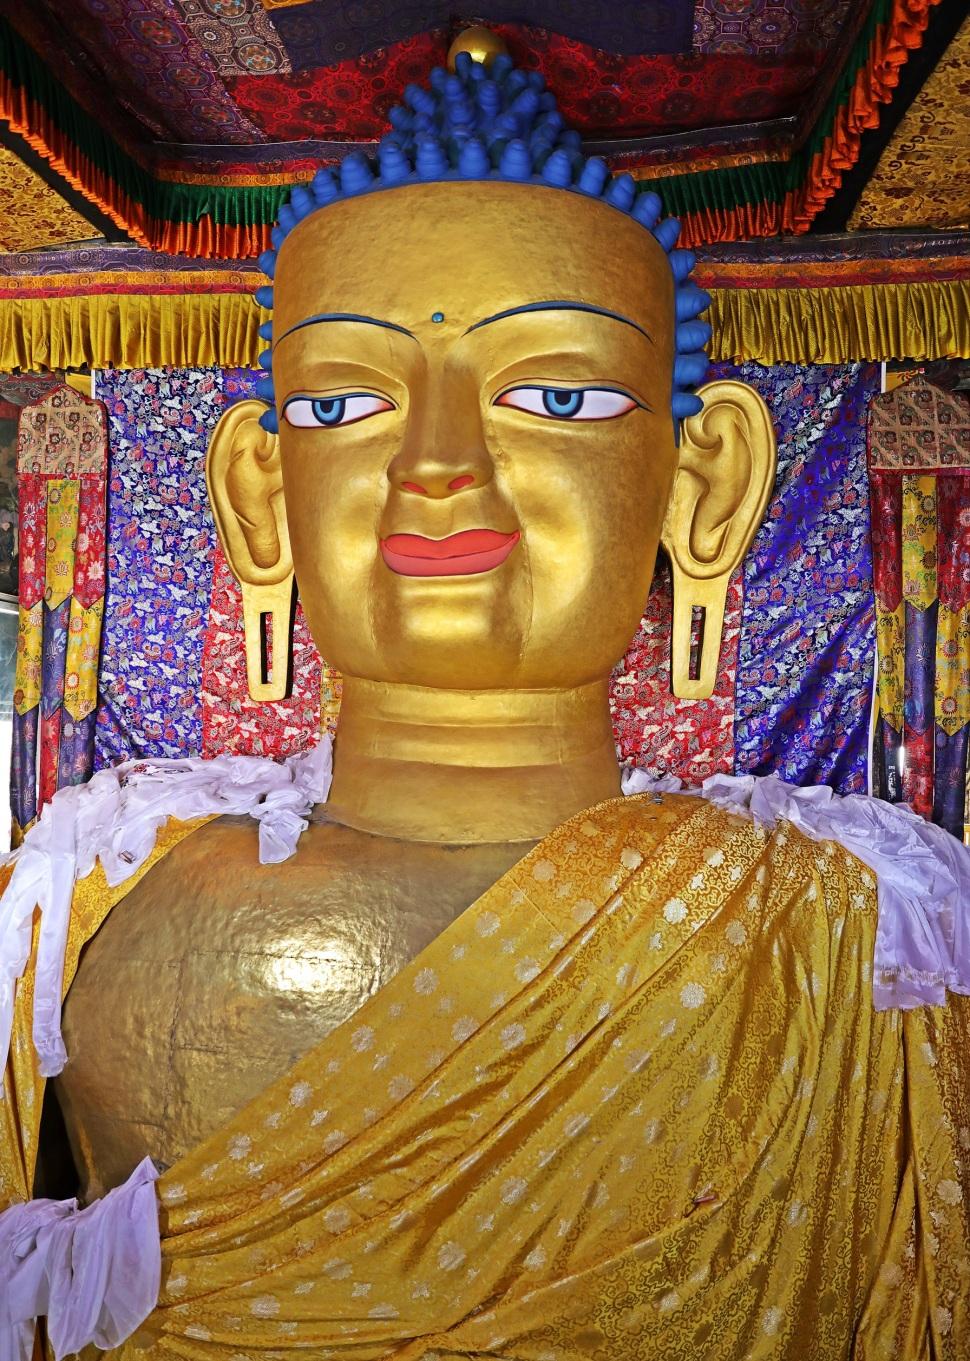 Buddha statue in Shey Palace